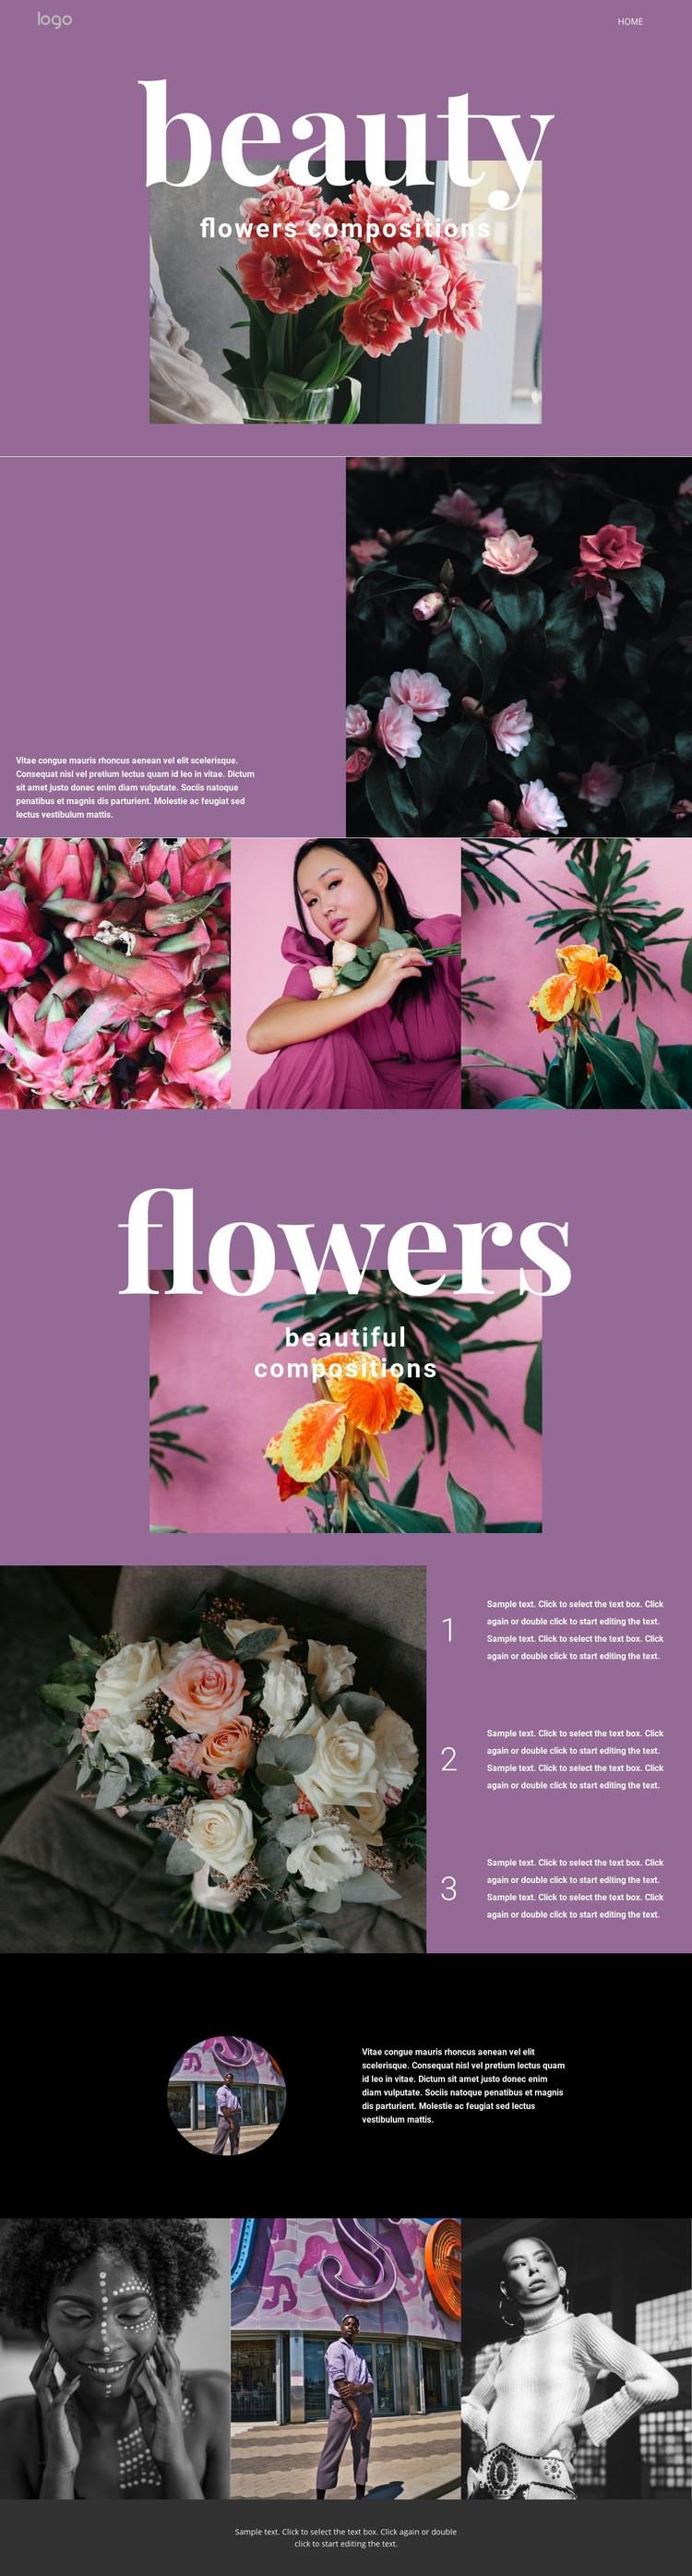 Flower salon Web Page Designer